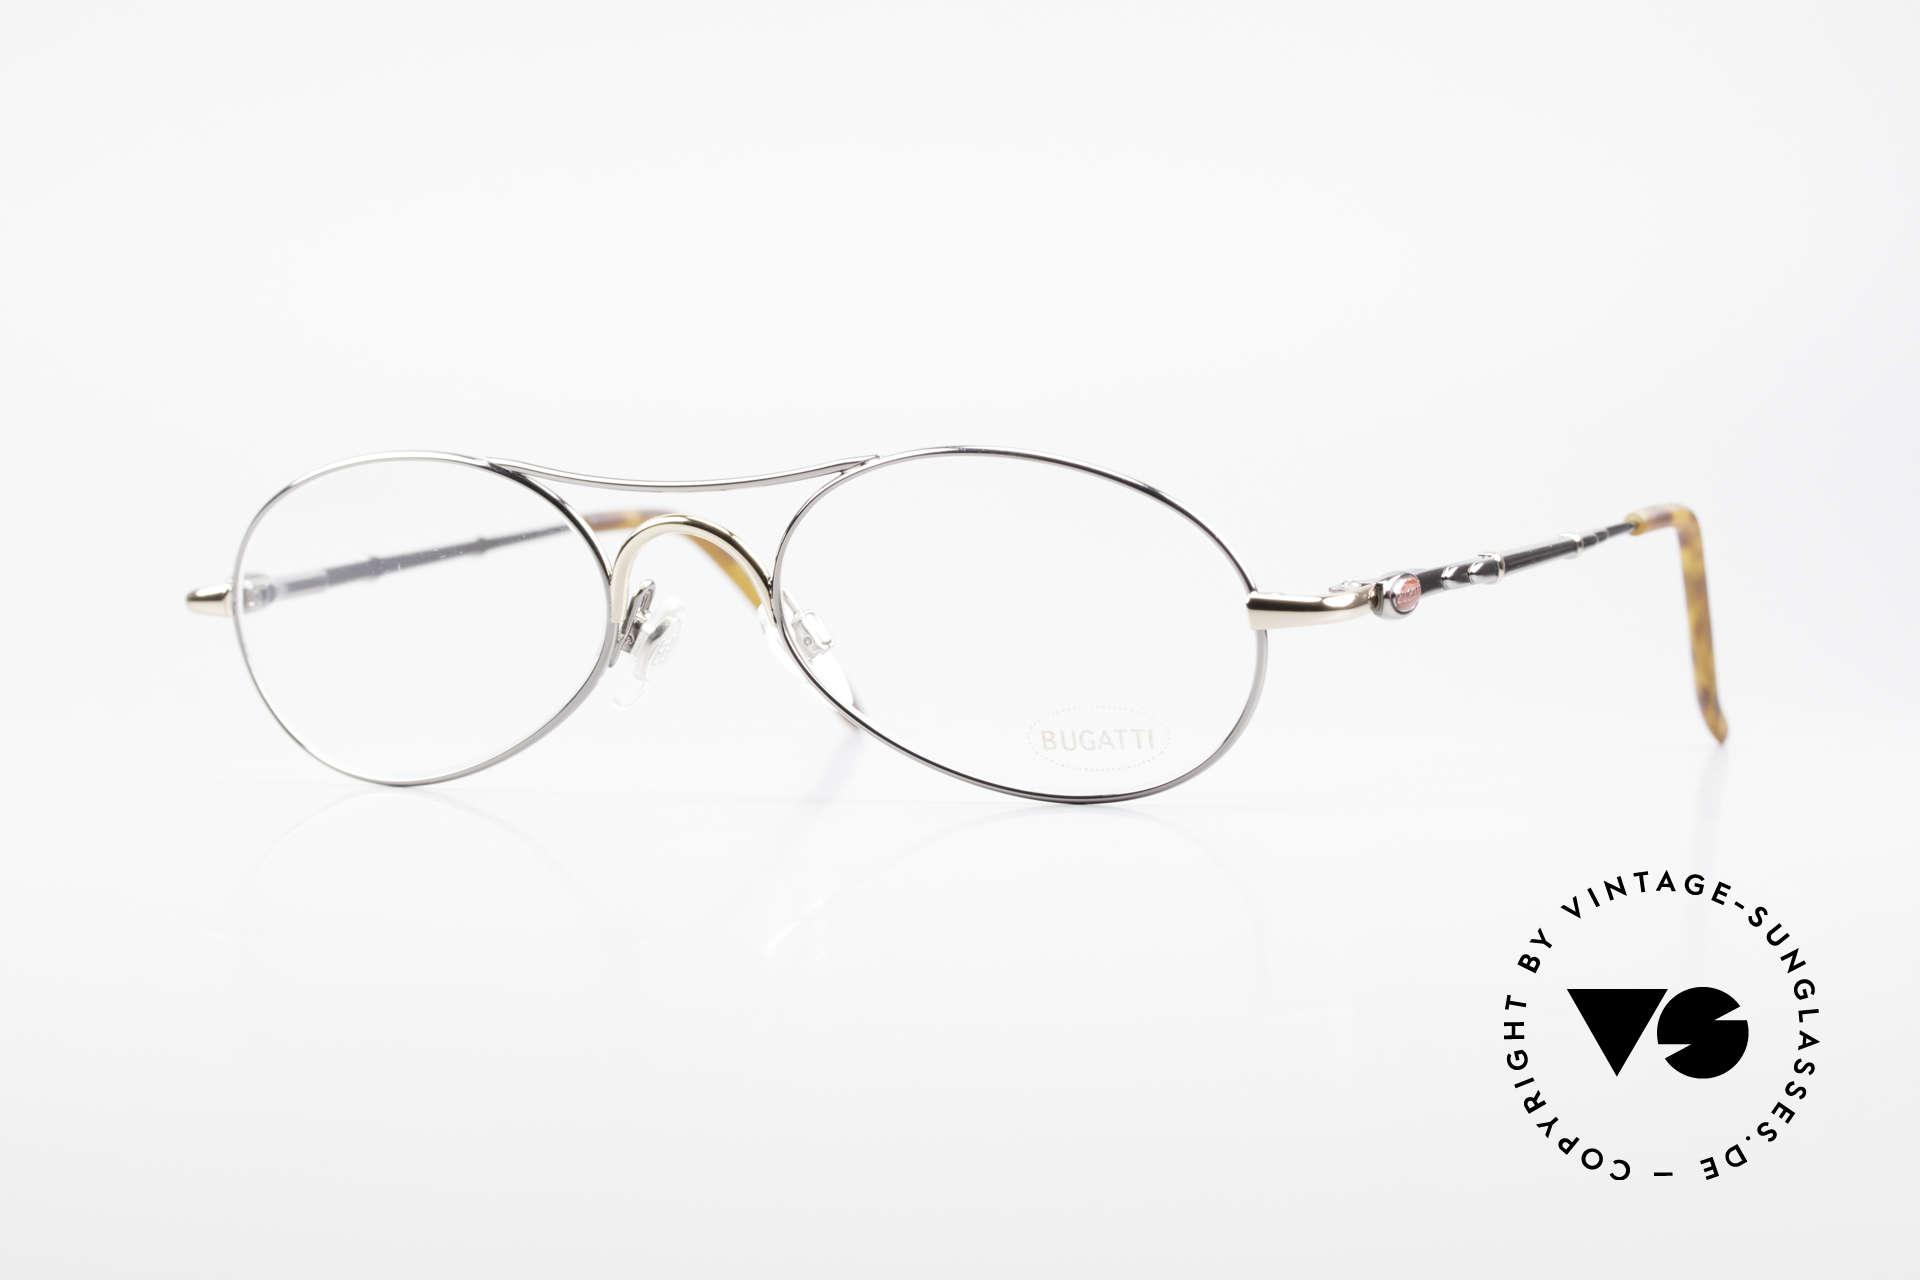 Bugatti 10692 Rare Luxury Men's Eyeglasses, very elegant vintage designer eyeglasses by Bugatti, Made for Men